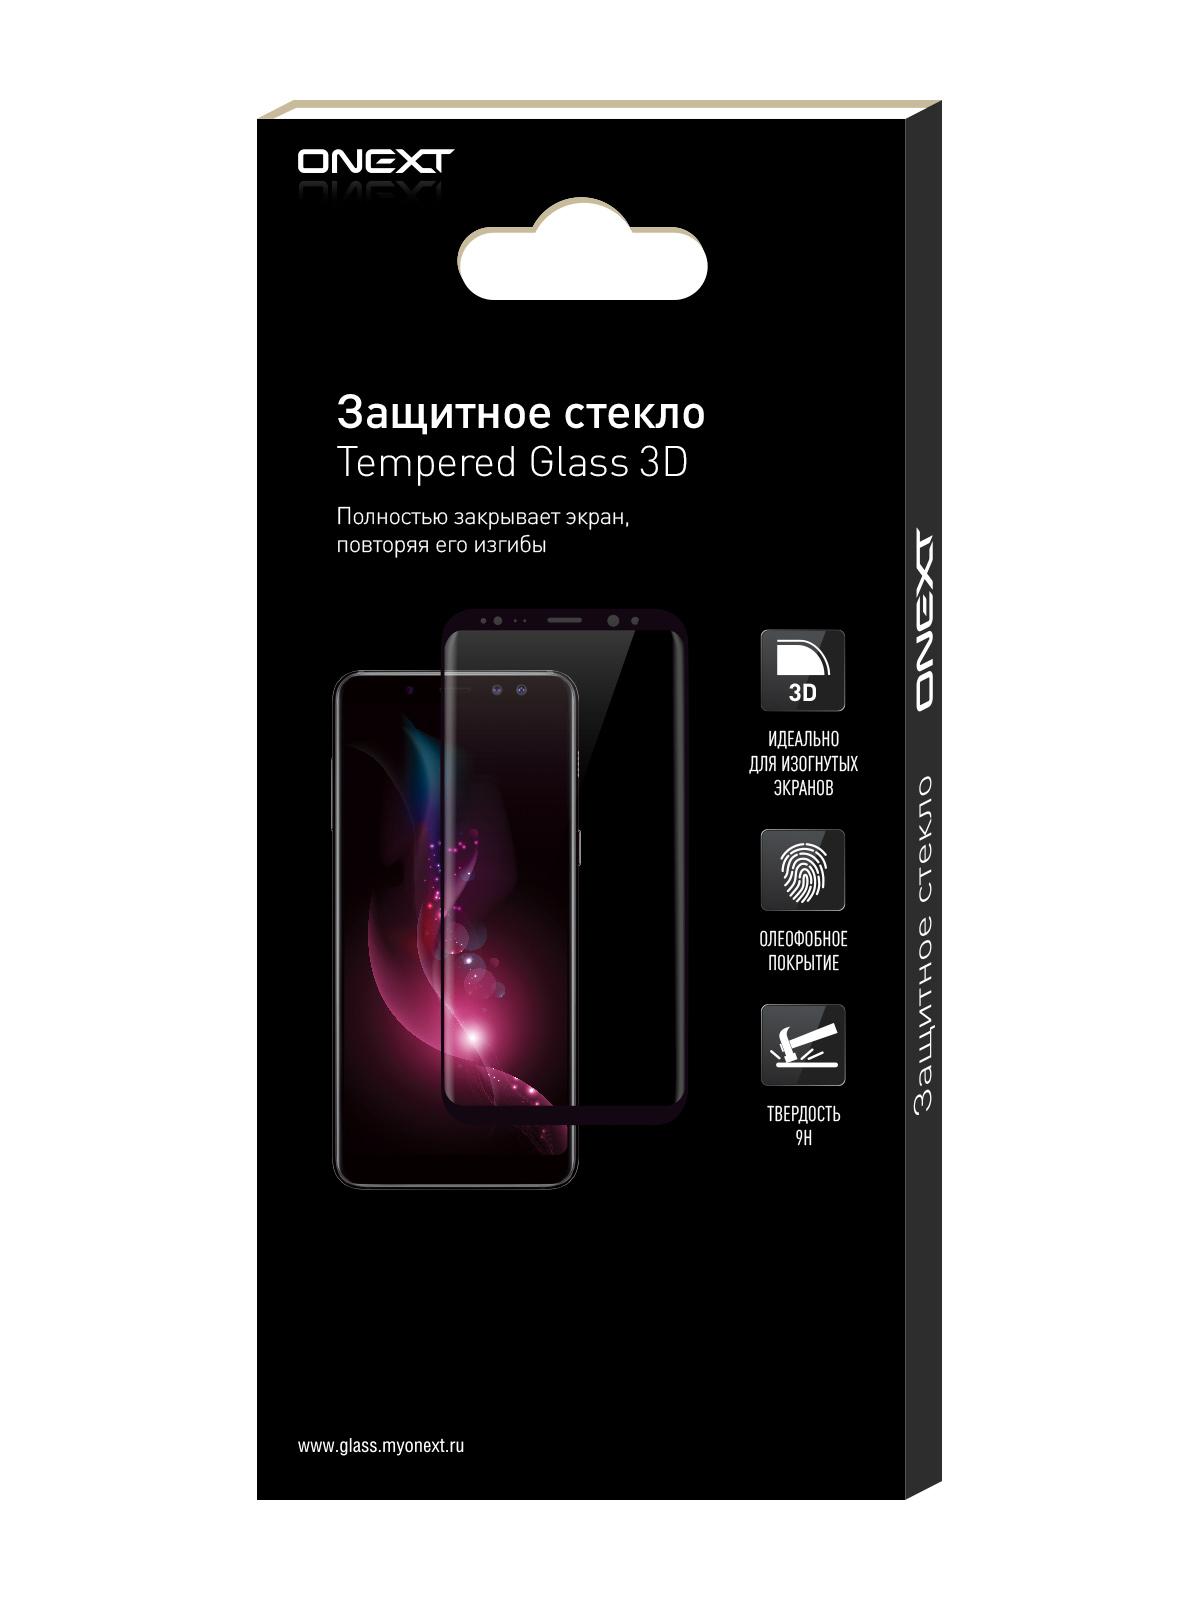 Защитное стекло ONEXT для Samsung Galaxy S6 Edge Black